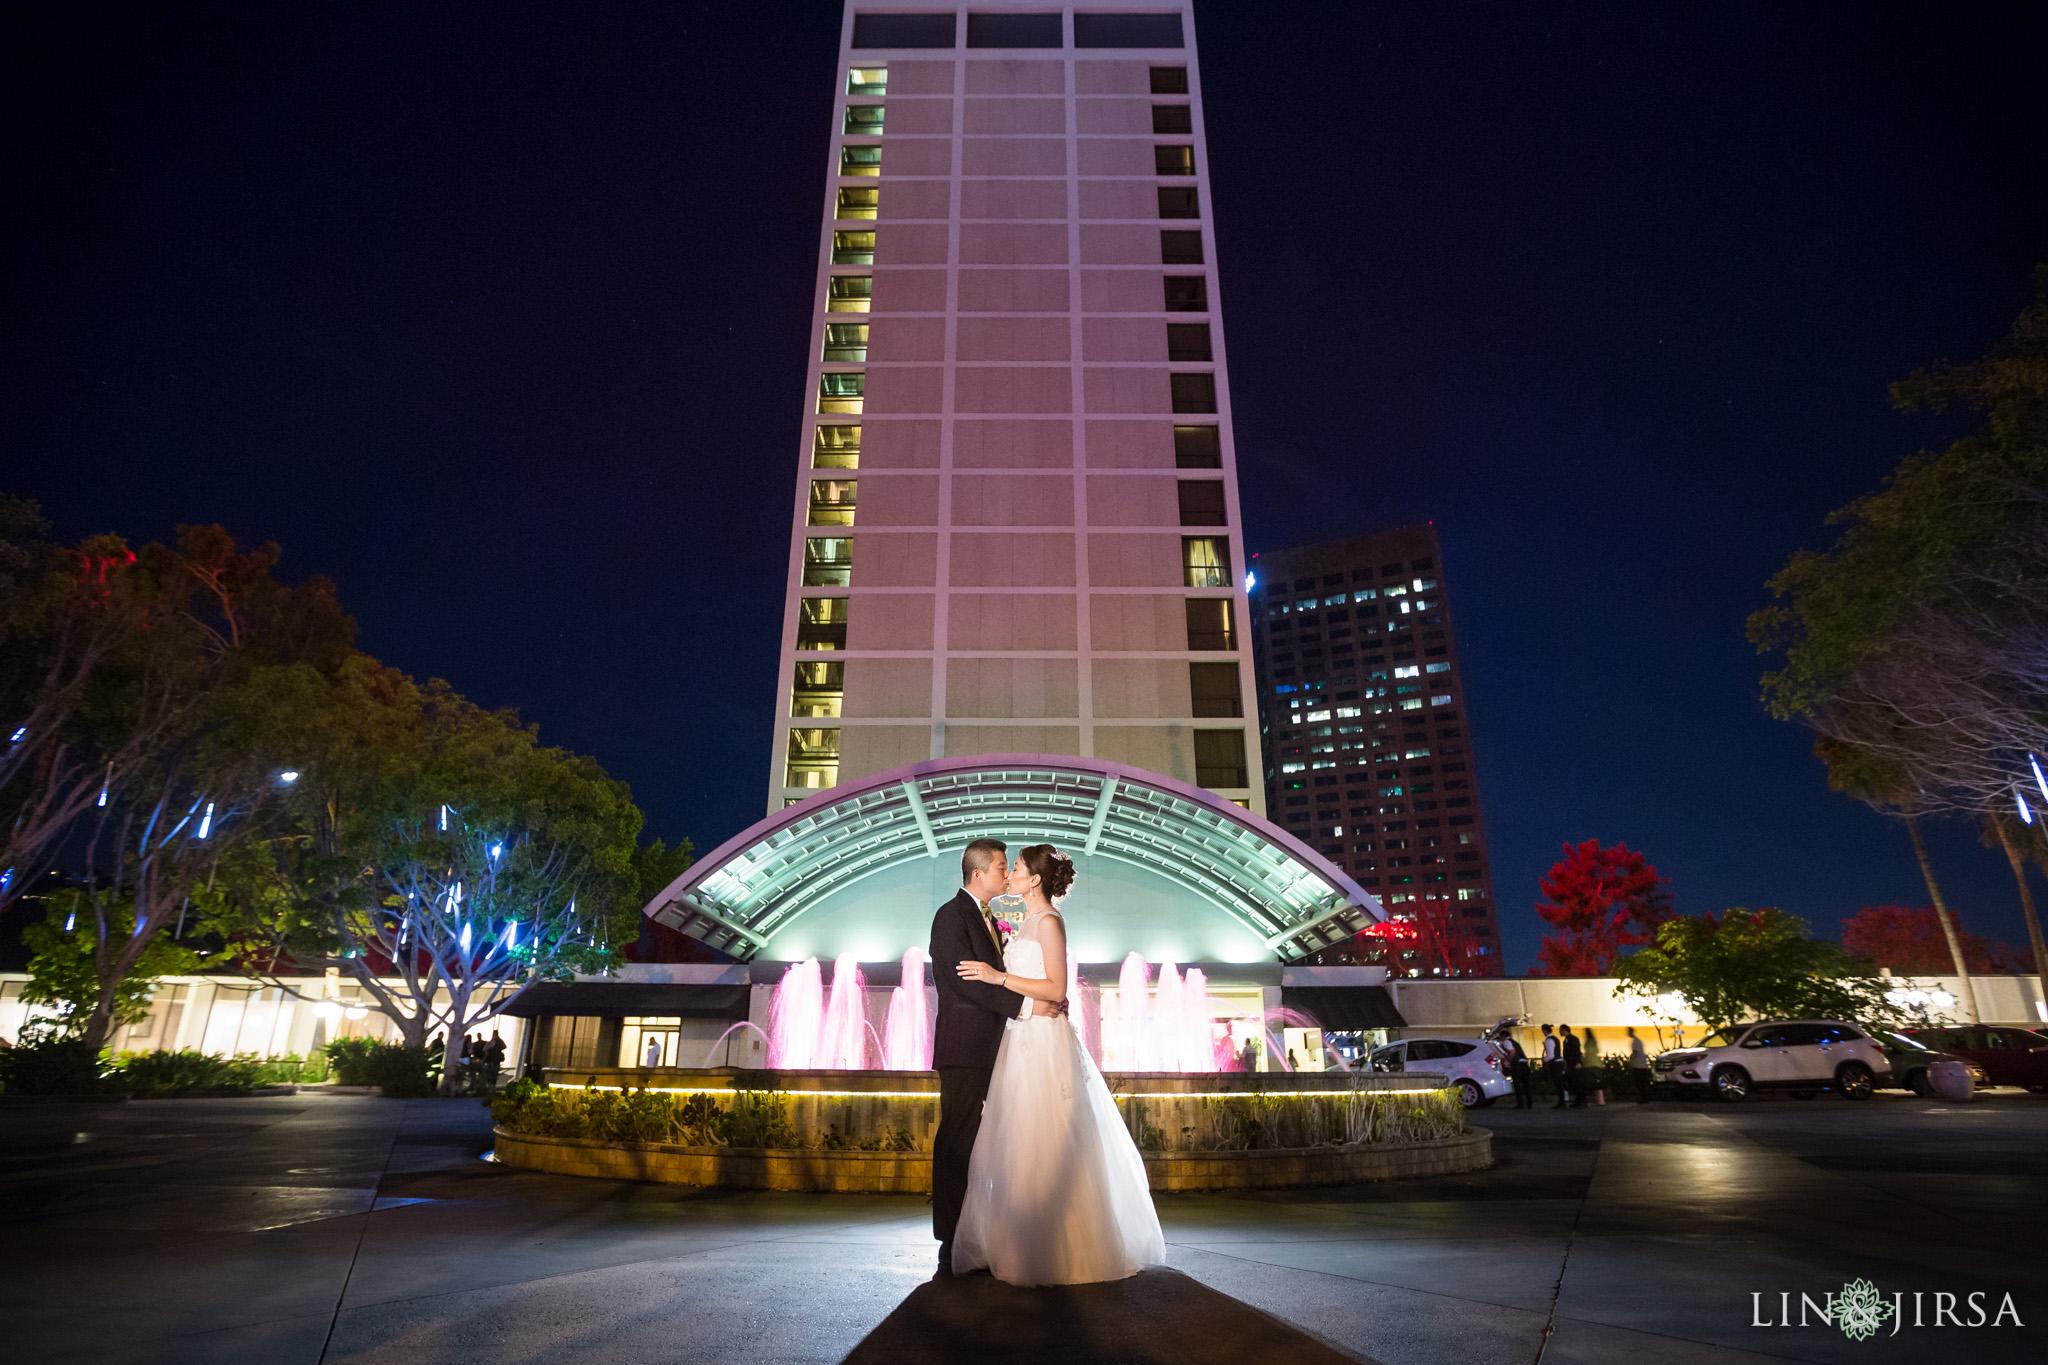 34-universal-city-sheraton-wedding-photography